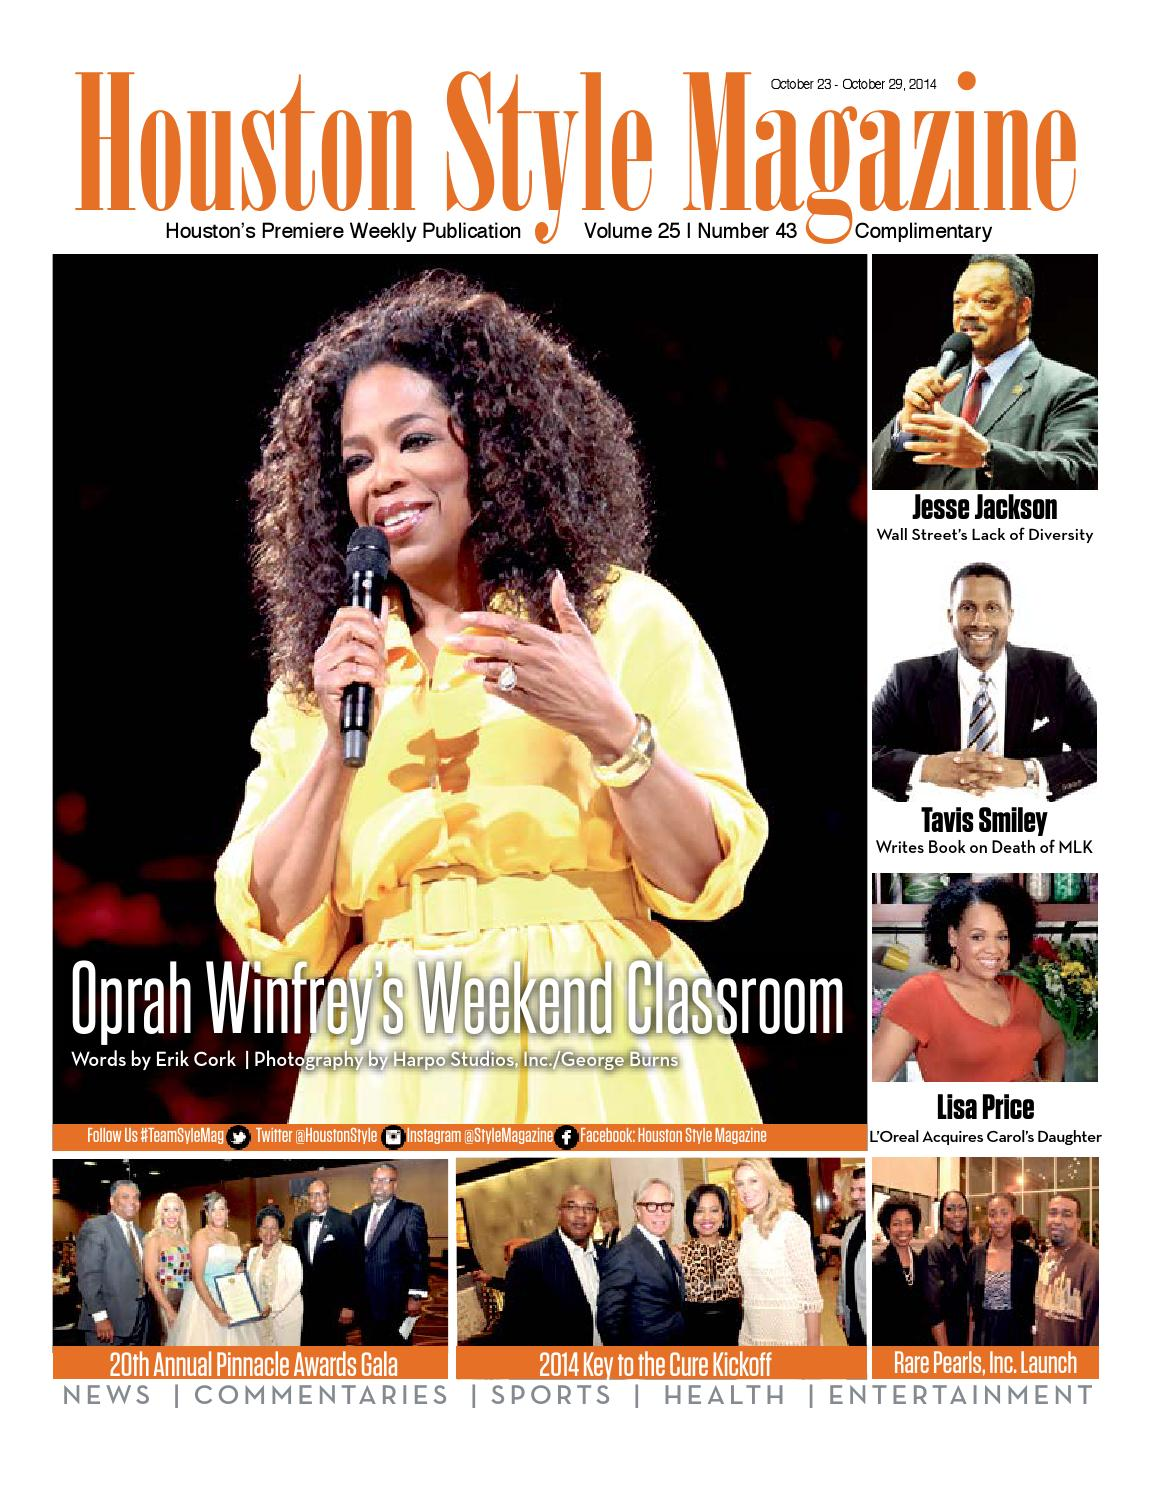 Houston Style Magazine Vol 25 No 43 By Houston Style Magazine Issuu